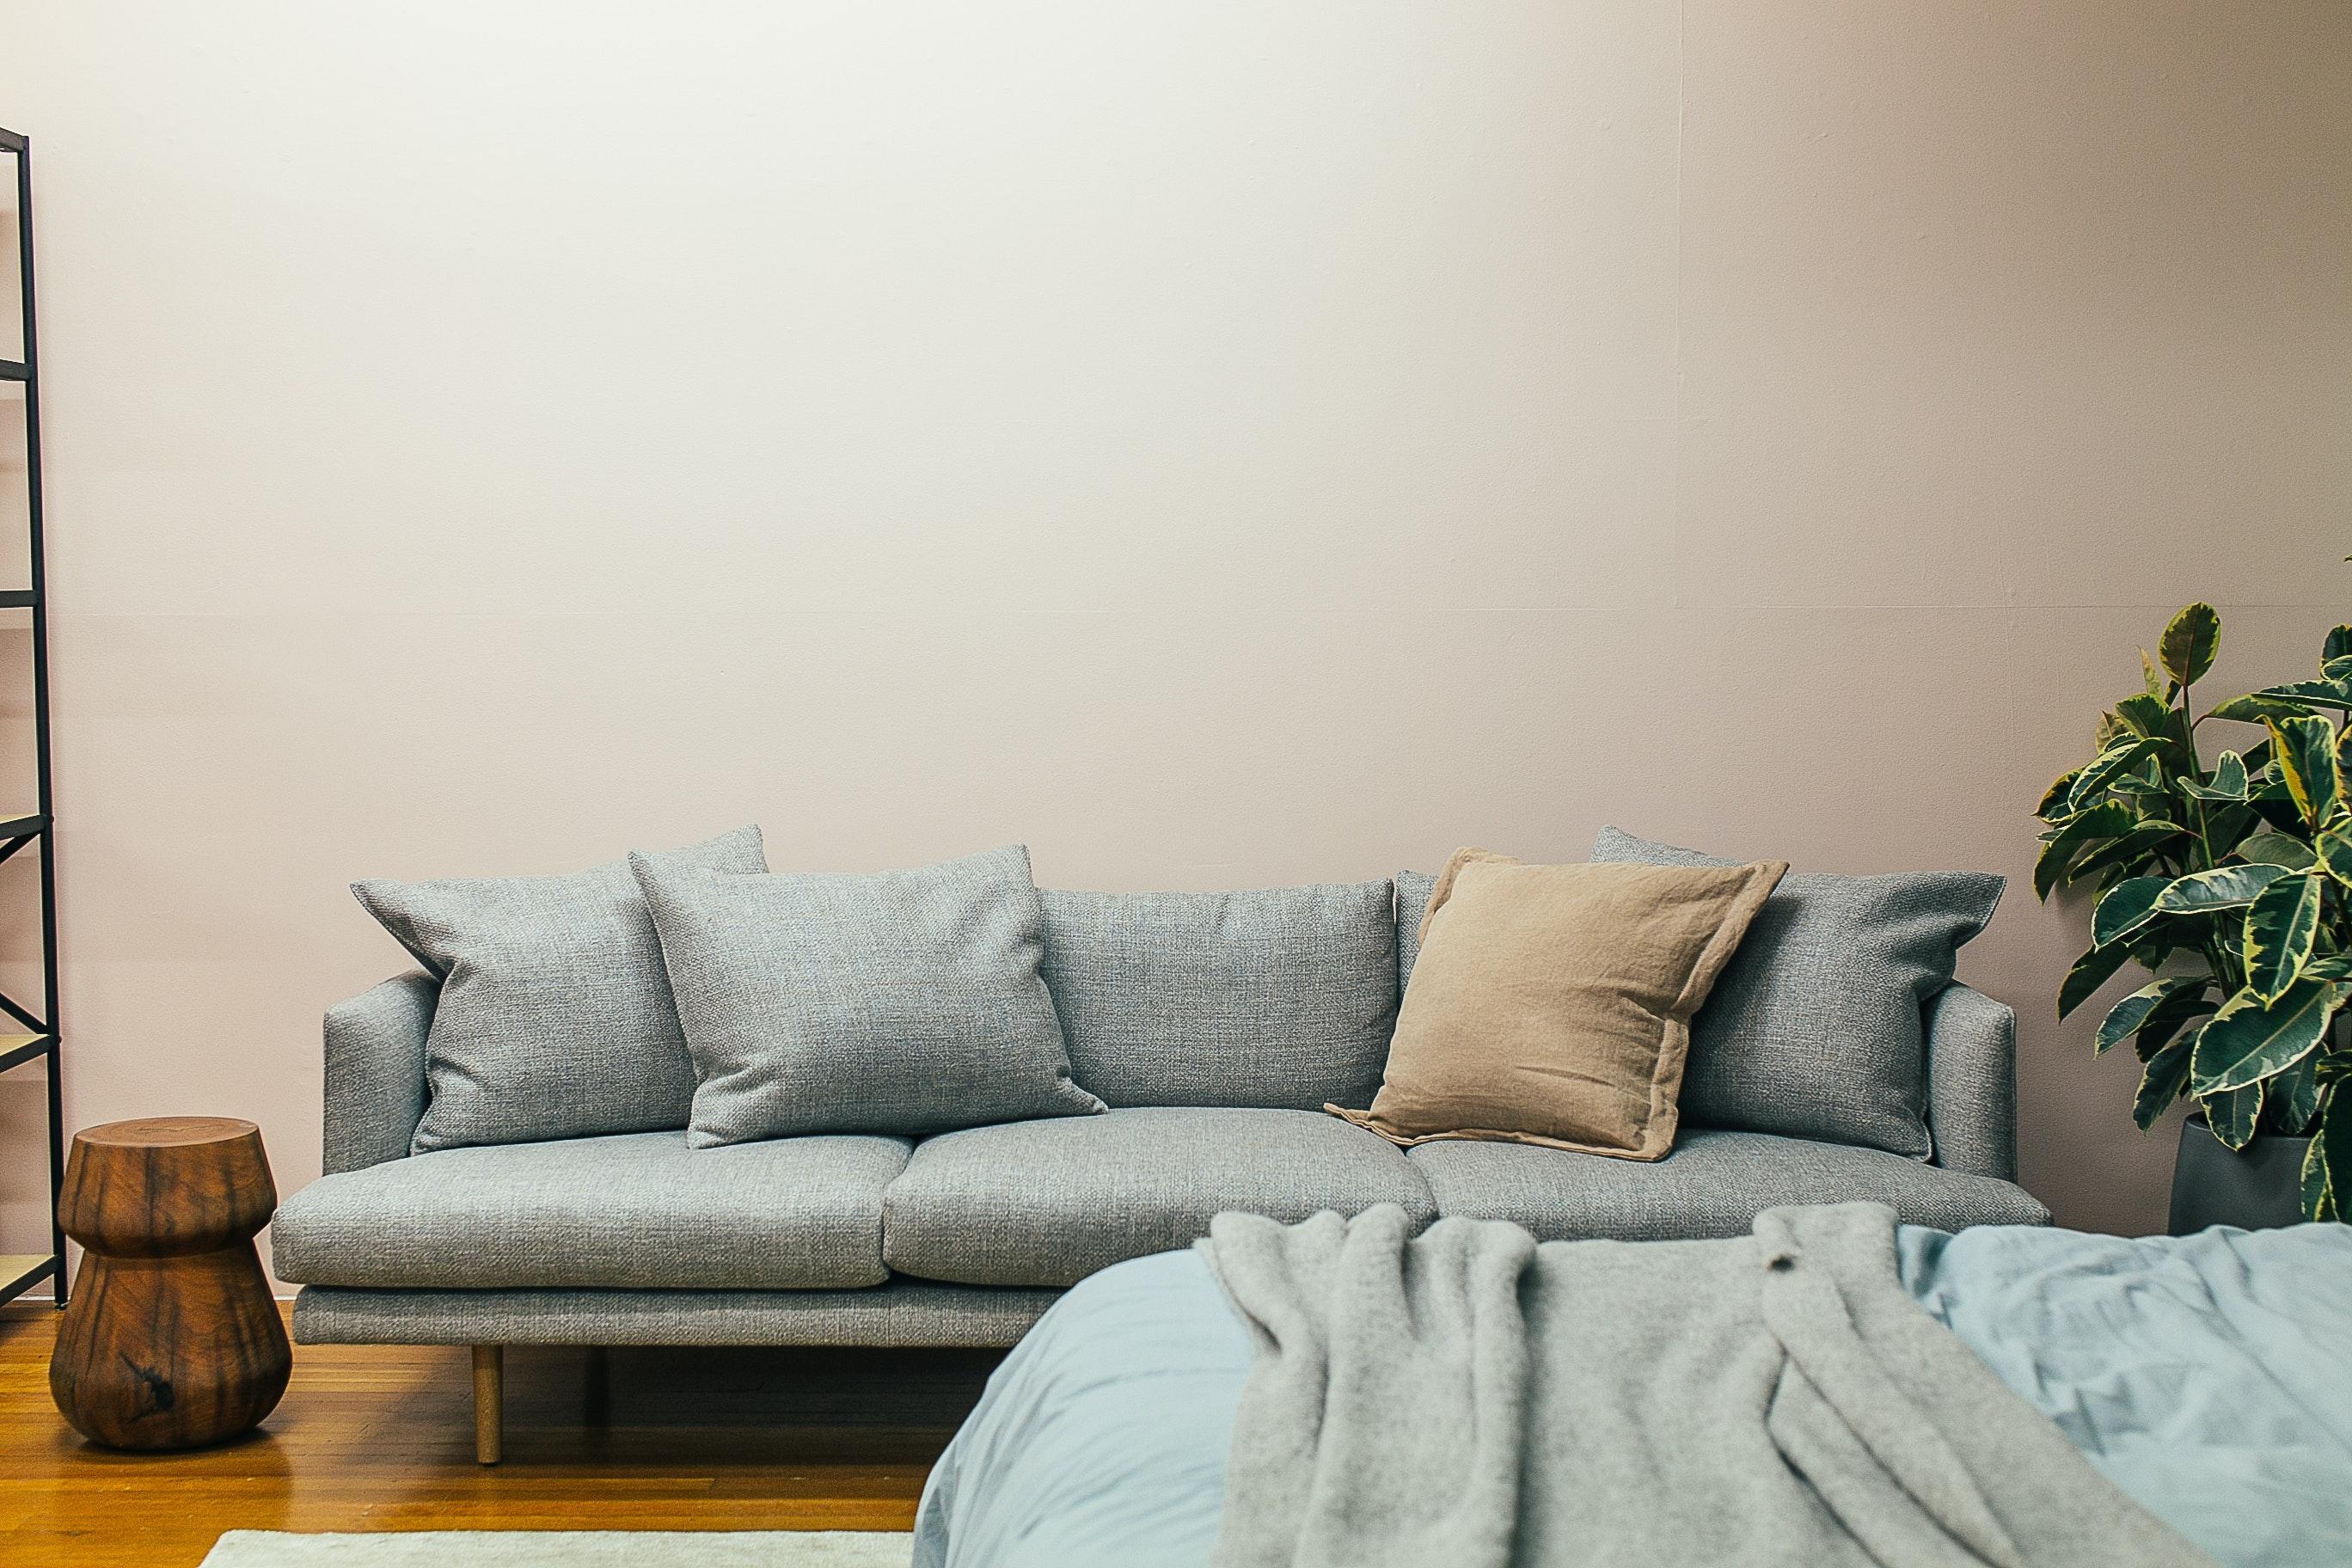 pexels rachel claire 4857775 - Mangler du en ny sofa til din stue?